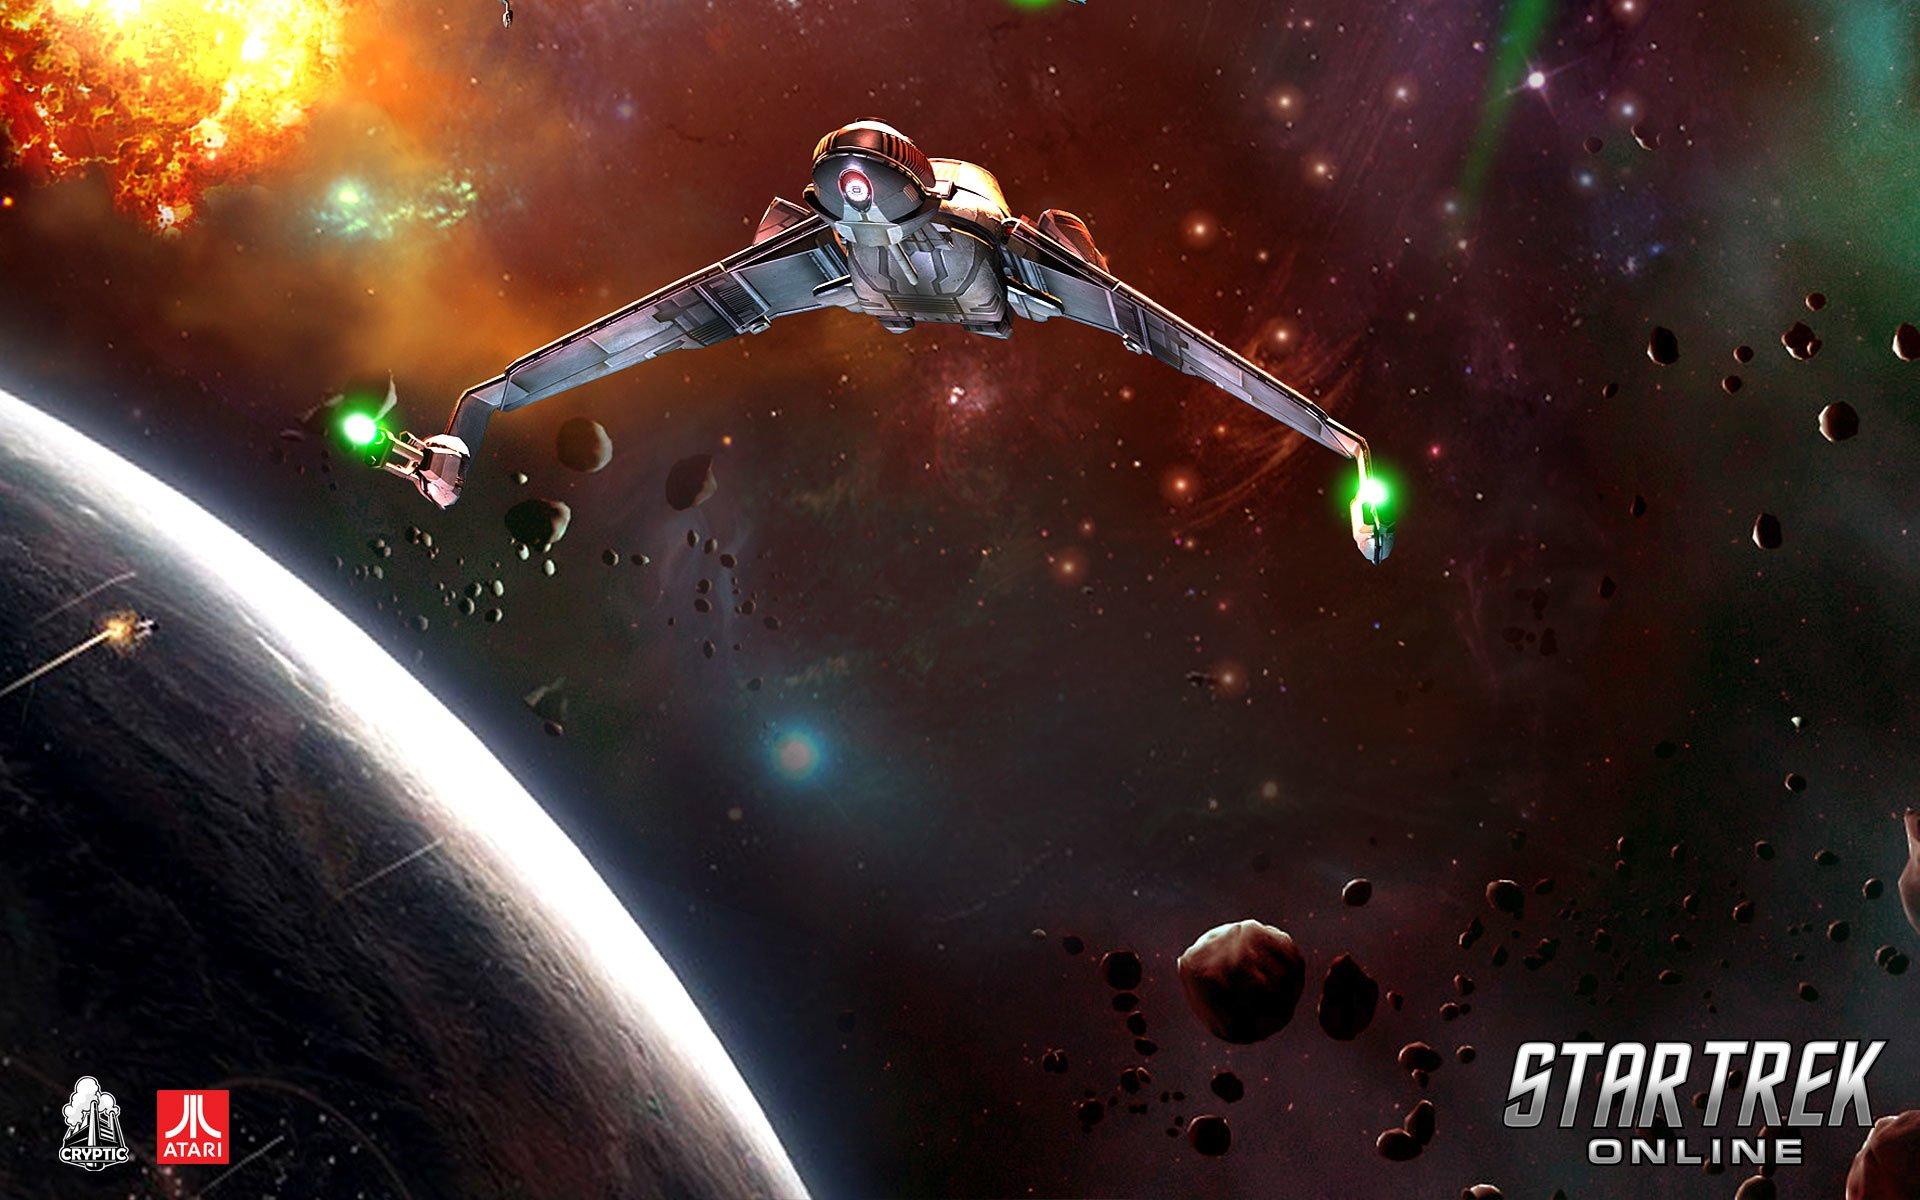 Iphone 5 Wallpaper Star Trek Star Trek Online Full Hd Wallpaper And Background Image